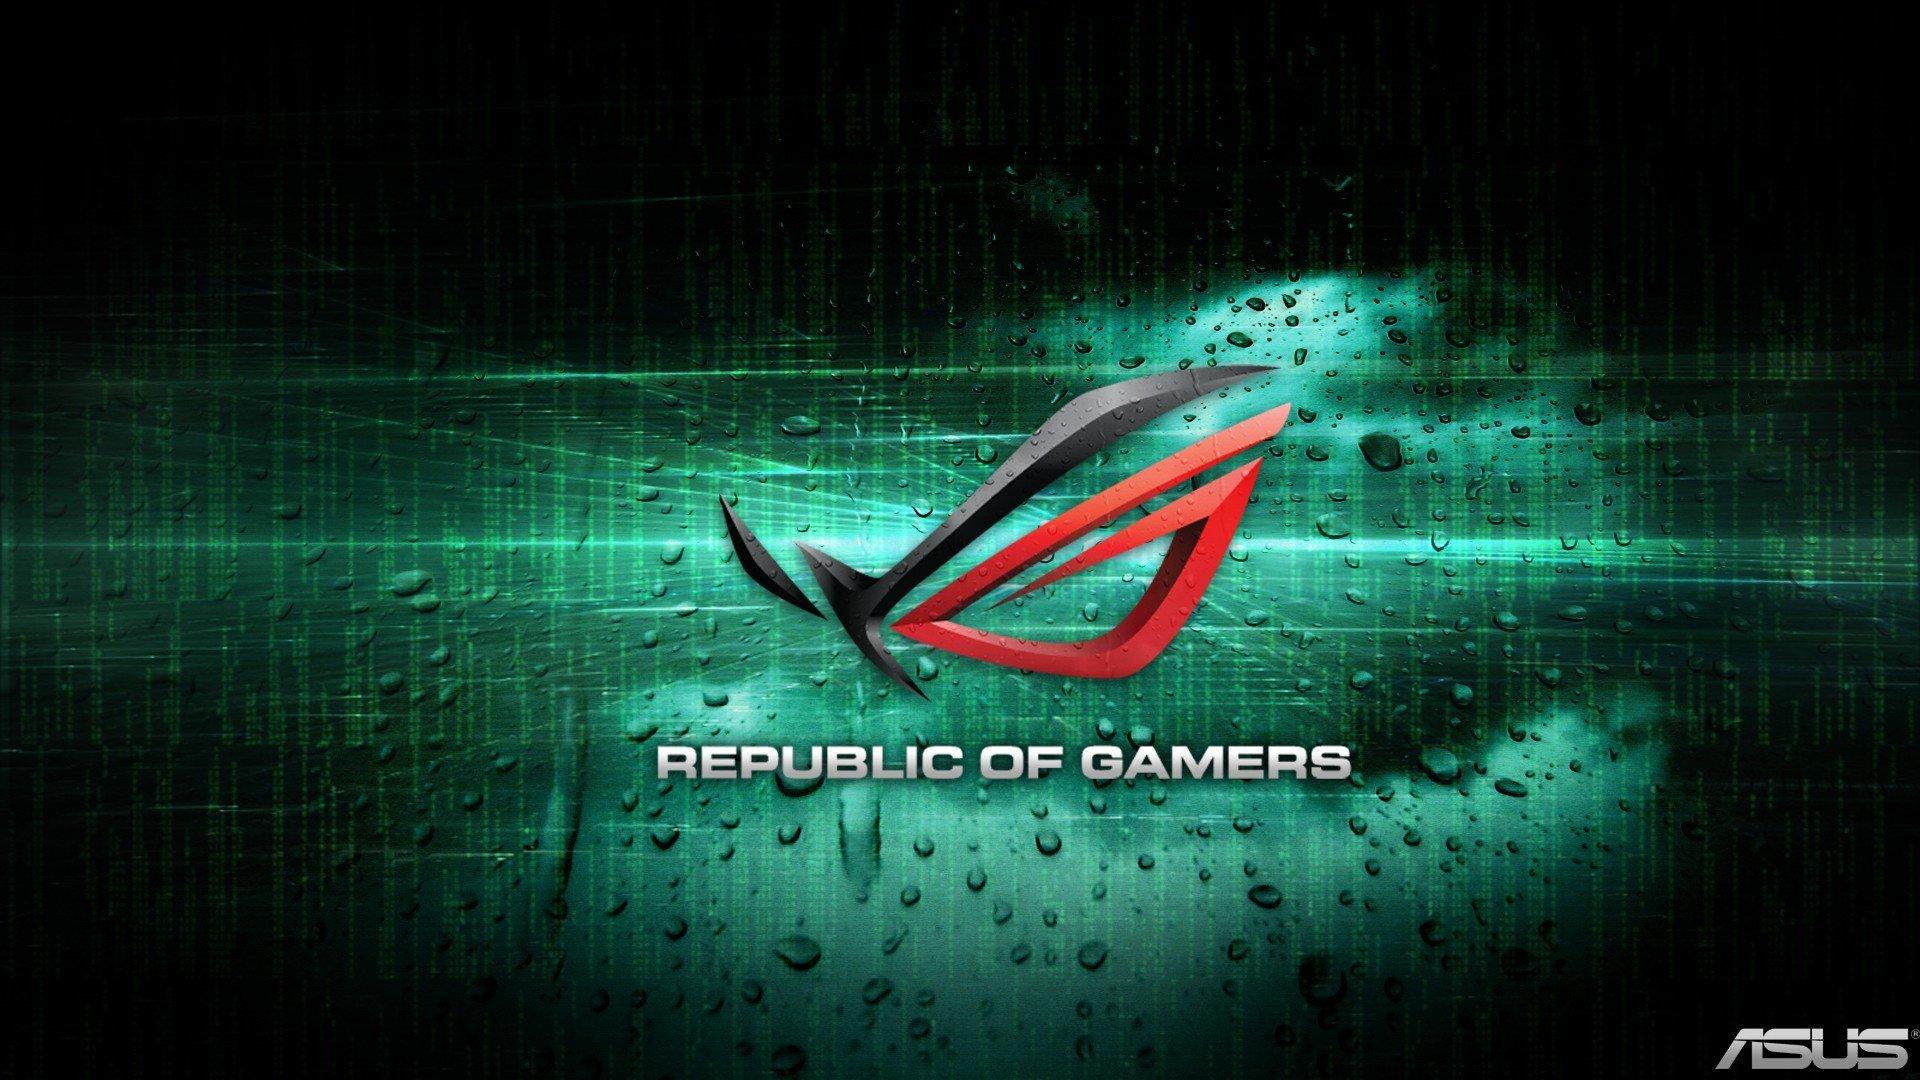 Wallpapers Republic Of Gamers HD Taringa 1920x1080